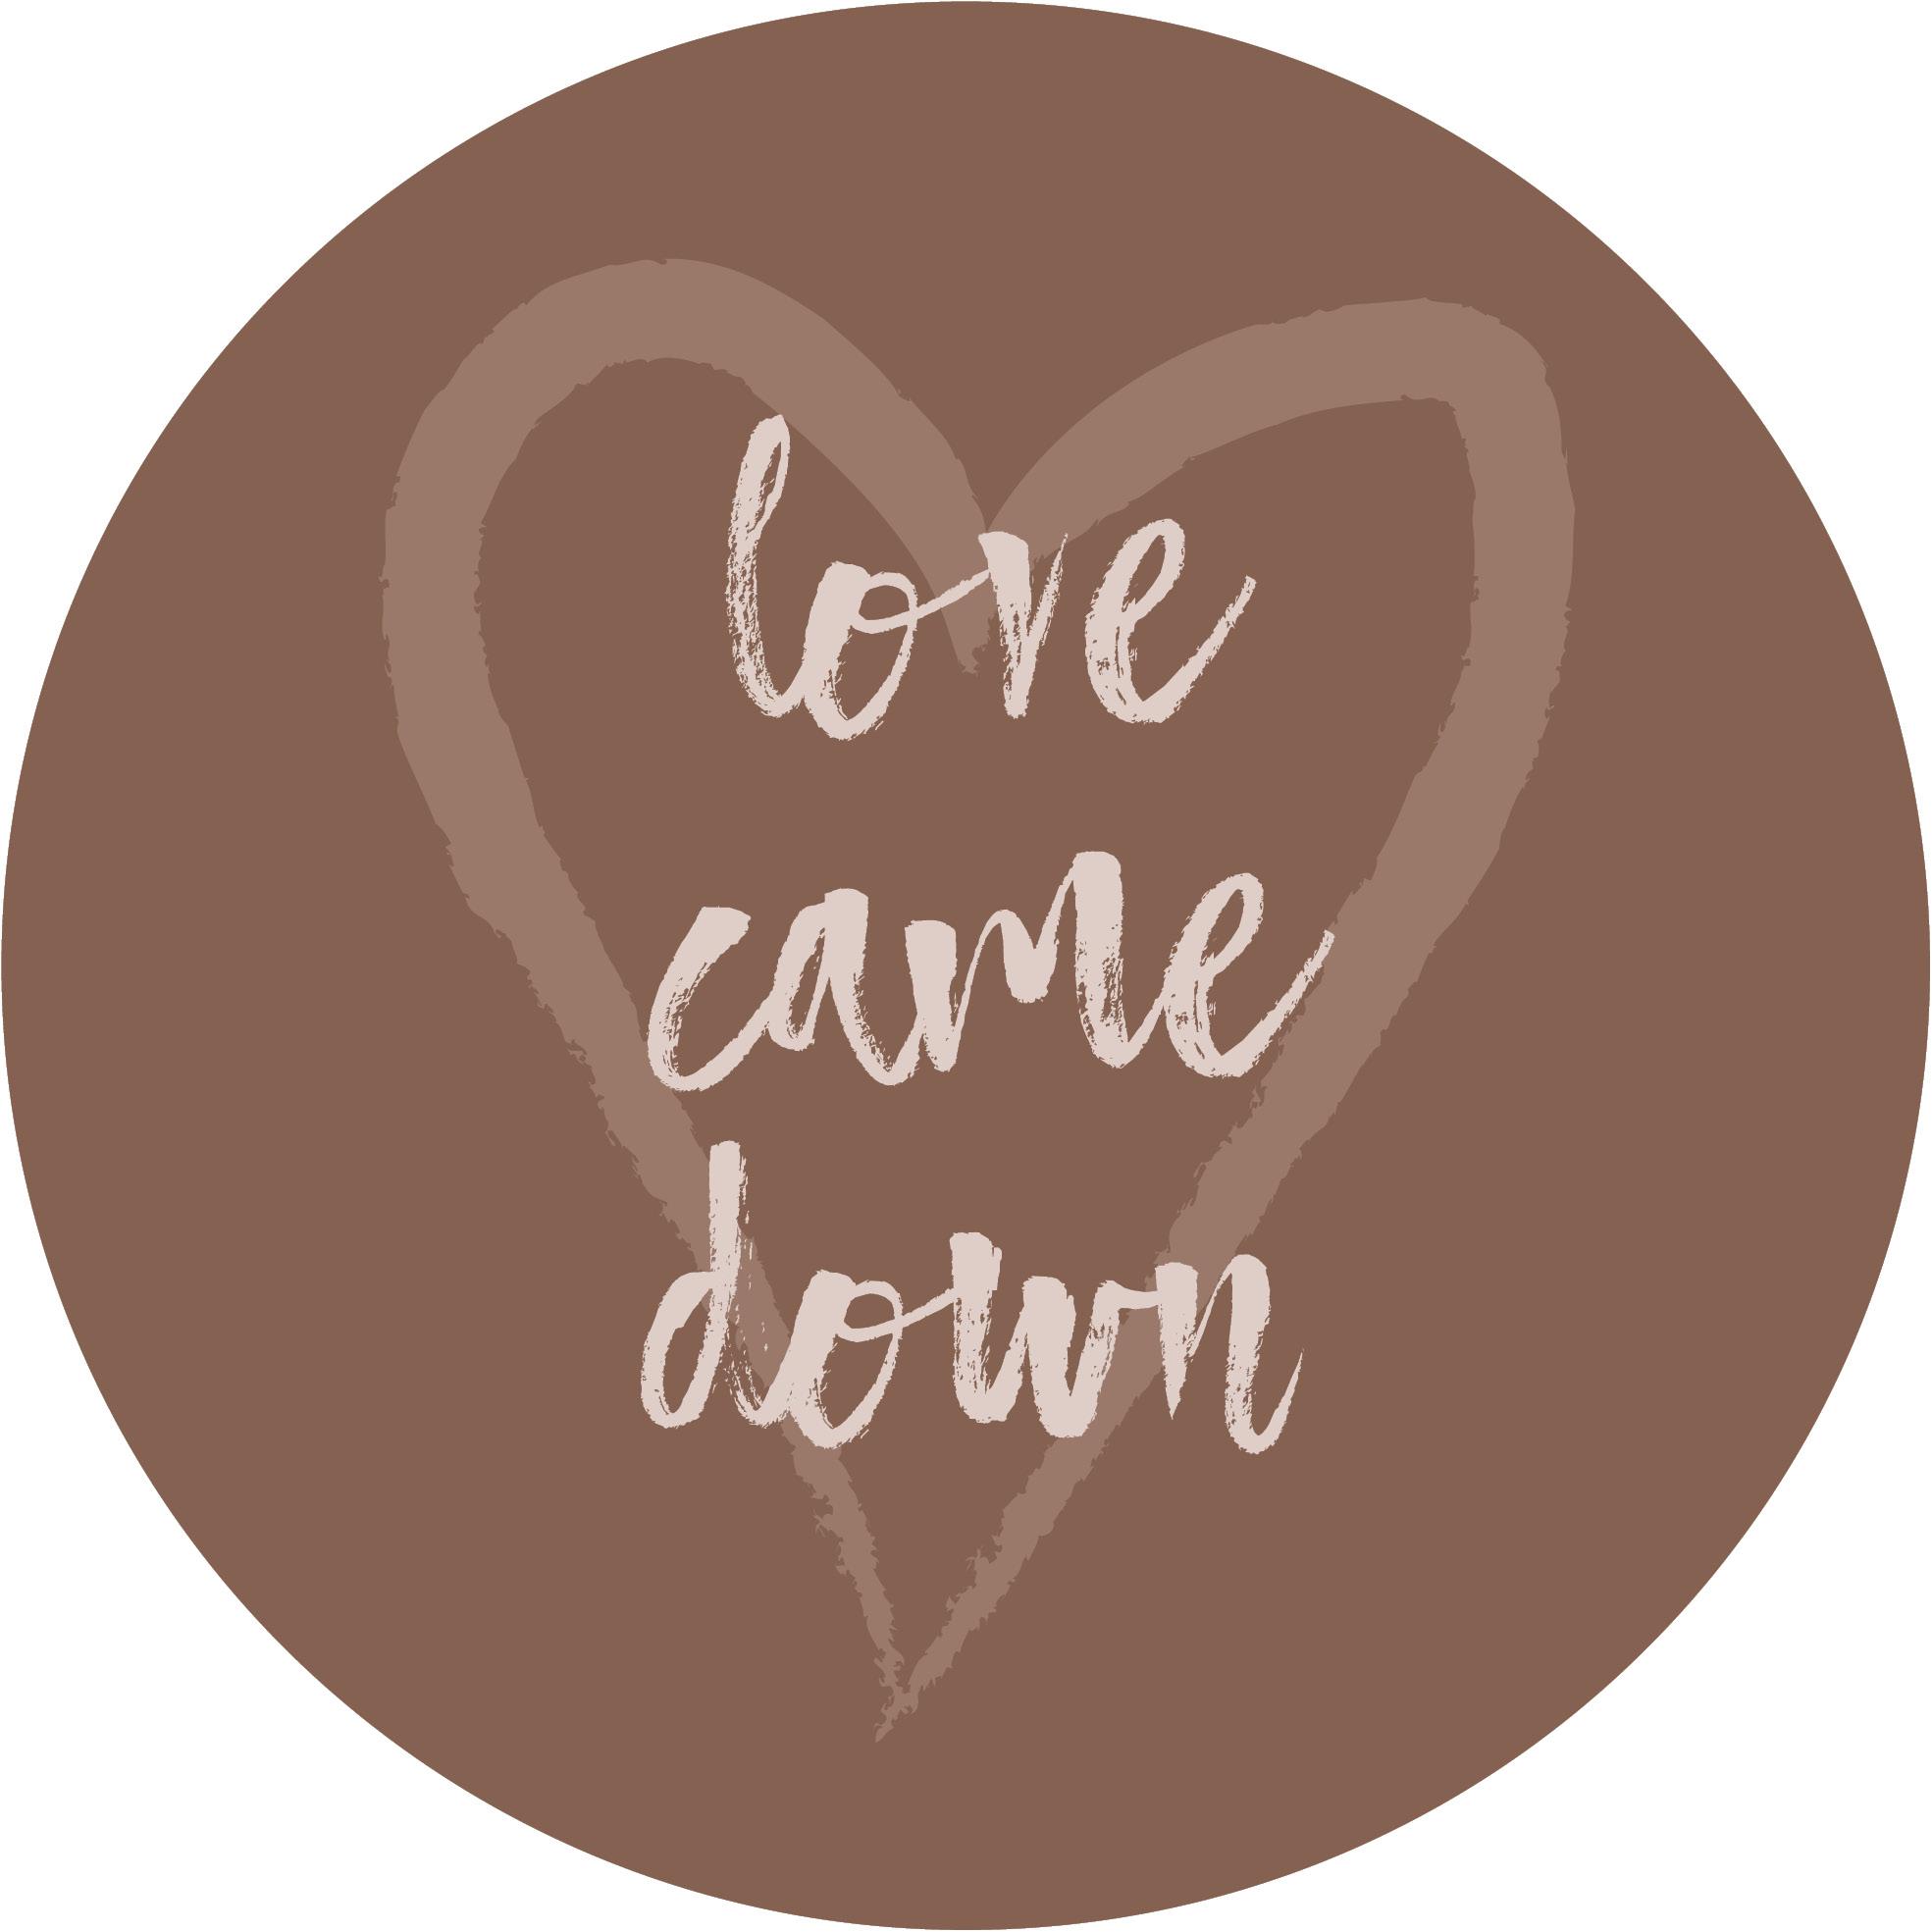 Muurcirkel Kerst Bruin 25 cm - Love came down